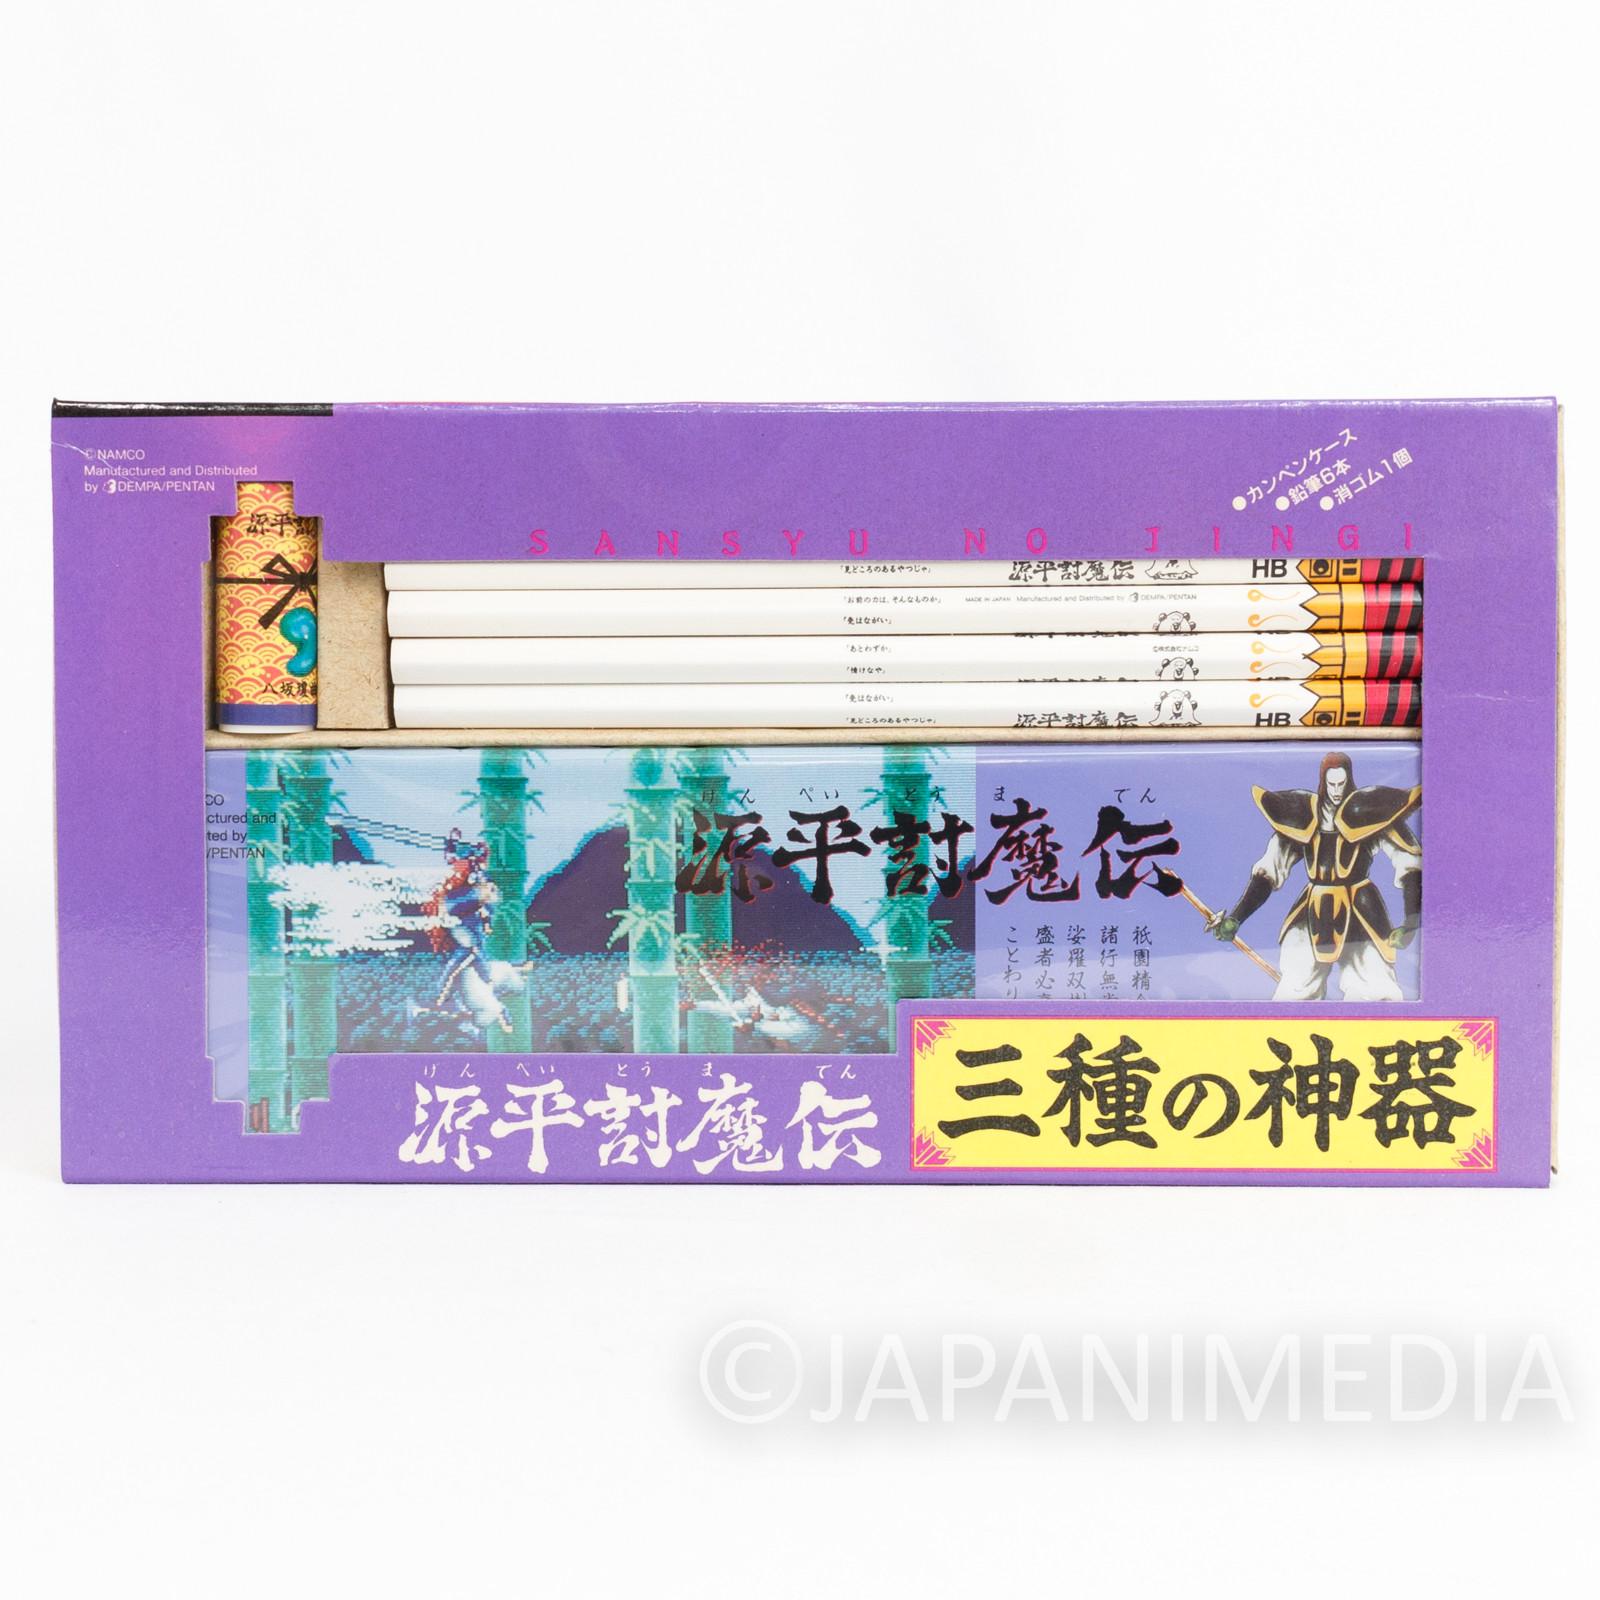 RARE!! Genpei Toma Den Stationery Set /Pen Case Pencil Eraser NAMCO